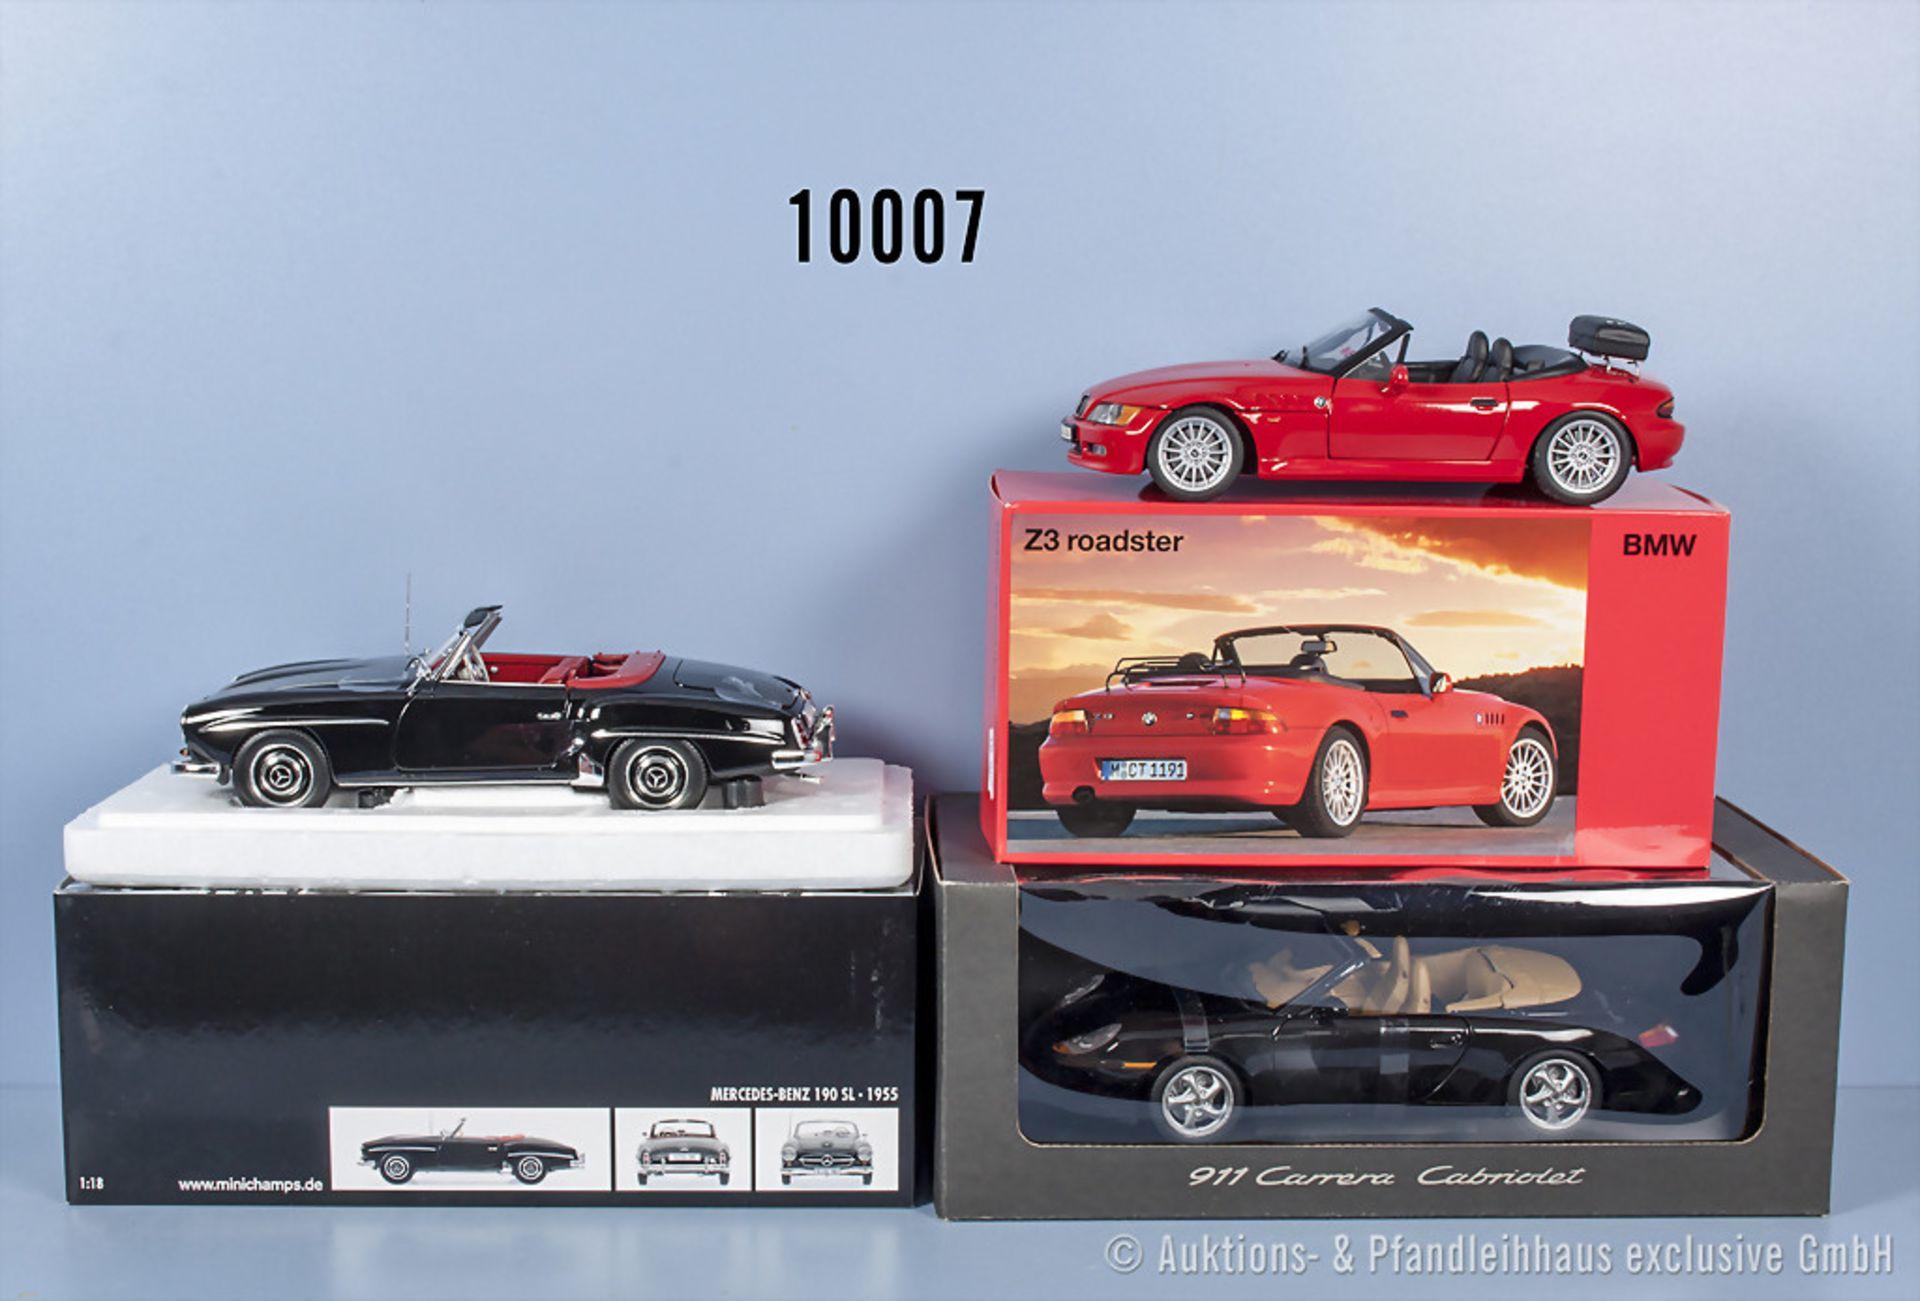 Konv. 3 Modellfahrzeuge dabei UT Models BMW Z3 Roadster, UT Models Porsche 911 Carrera ...